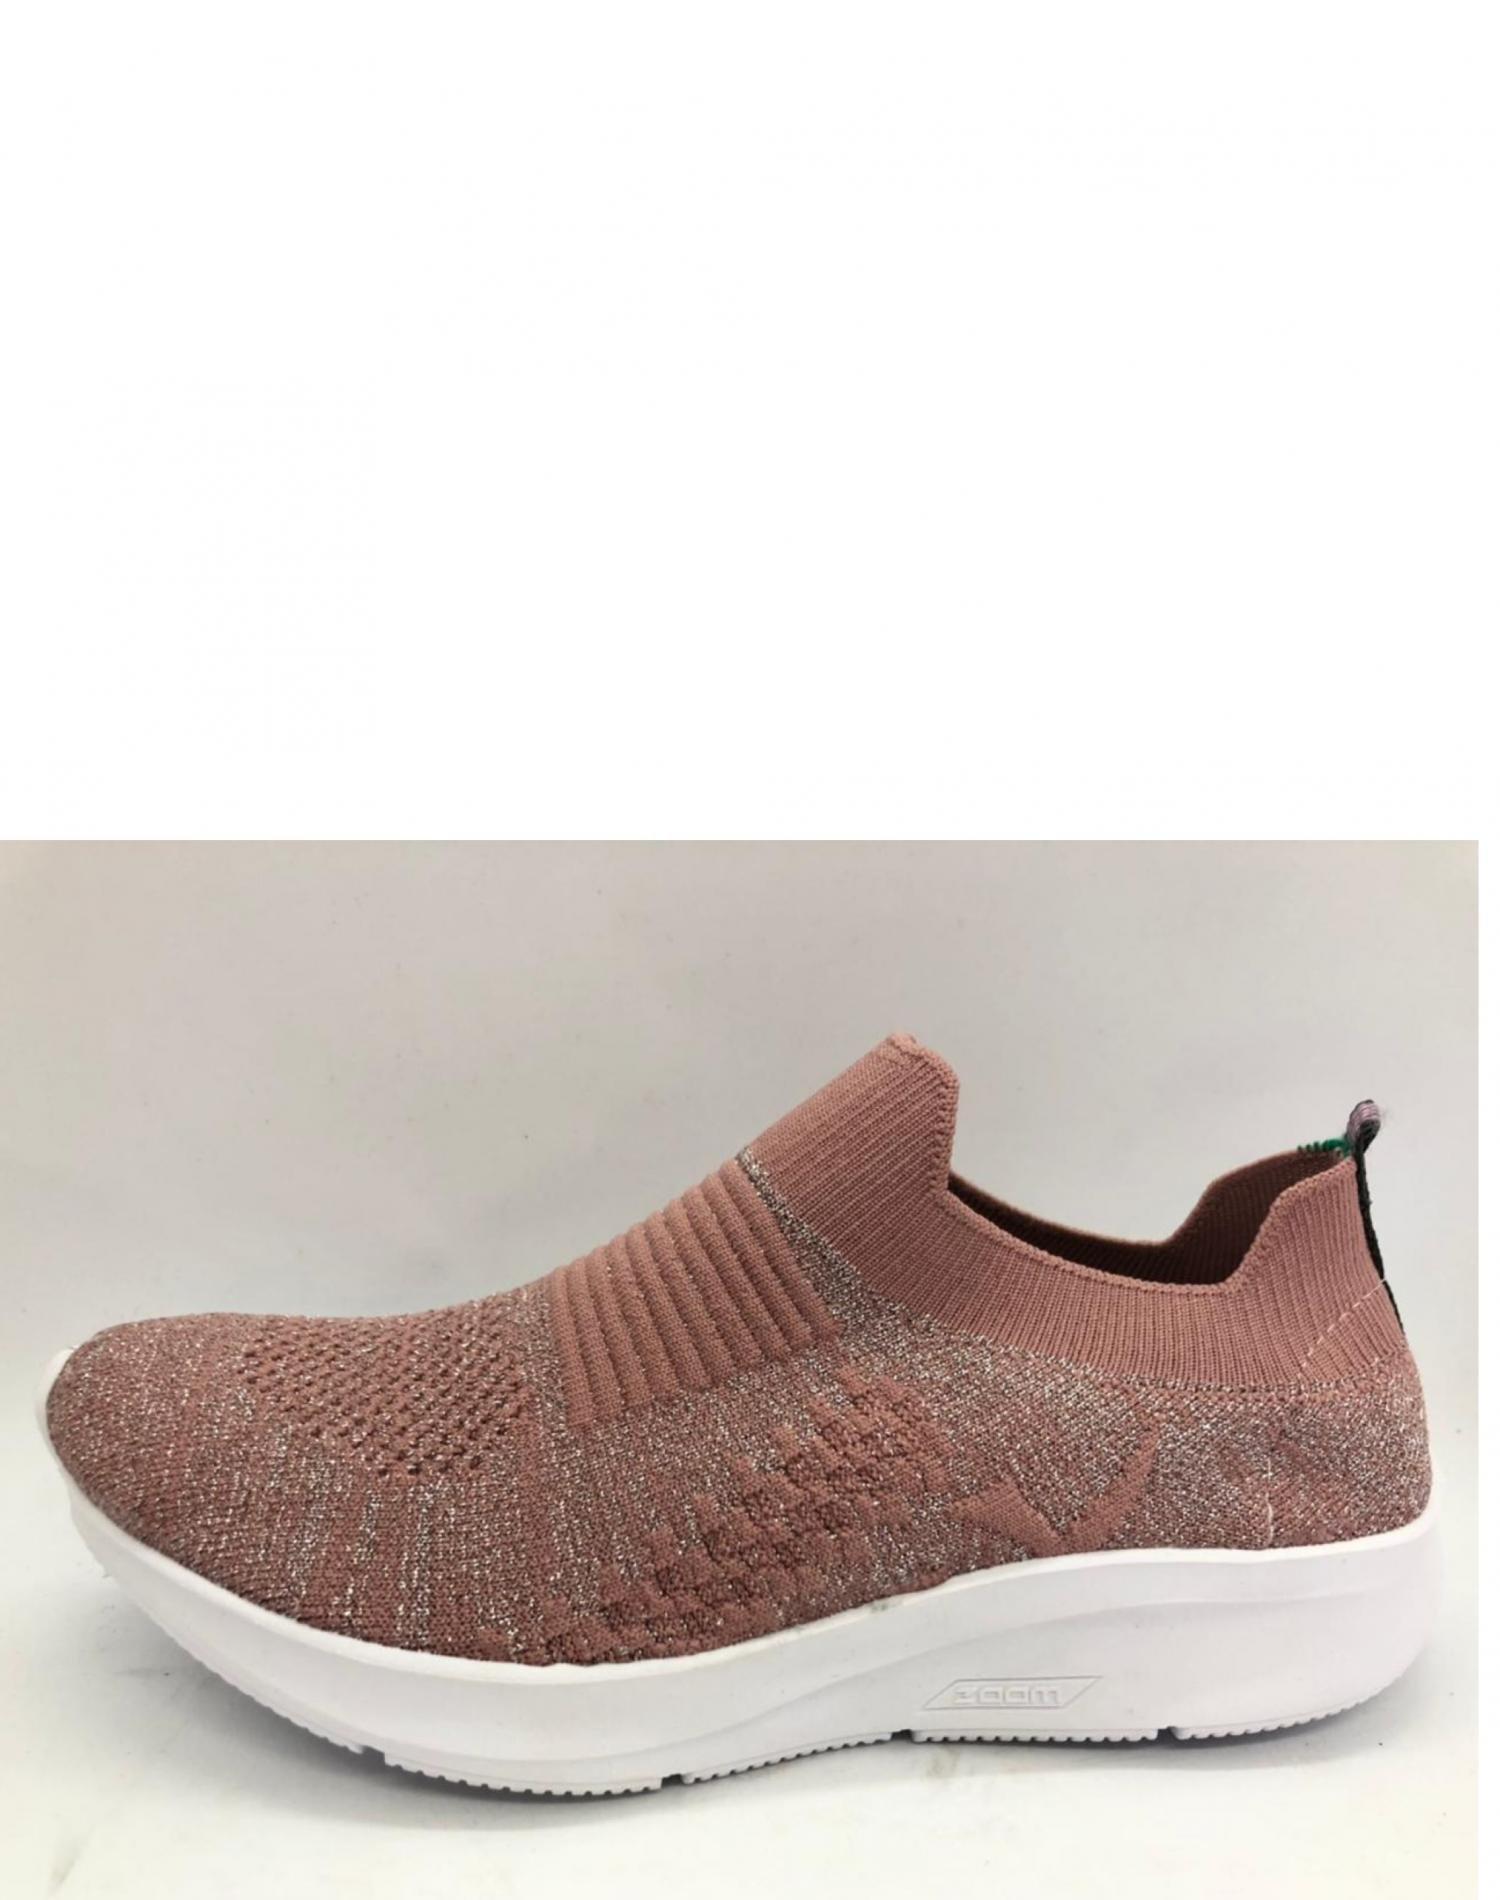 Zapatilla Rosa One Foot Lurex